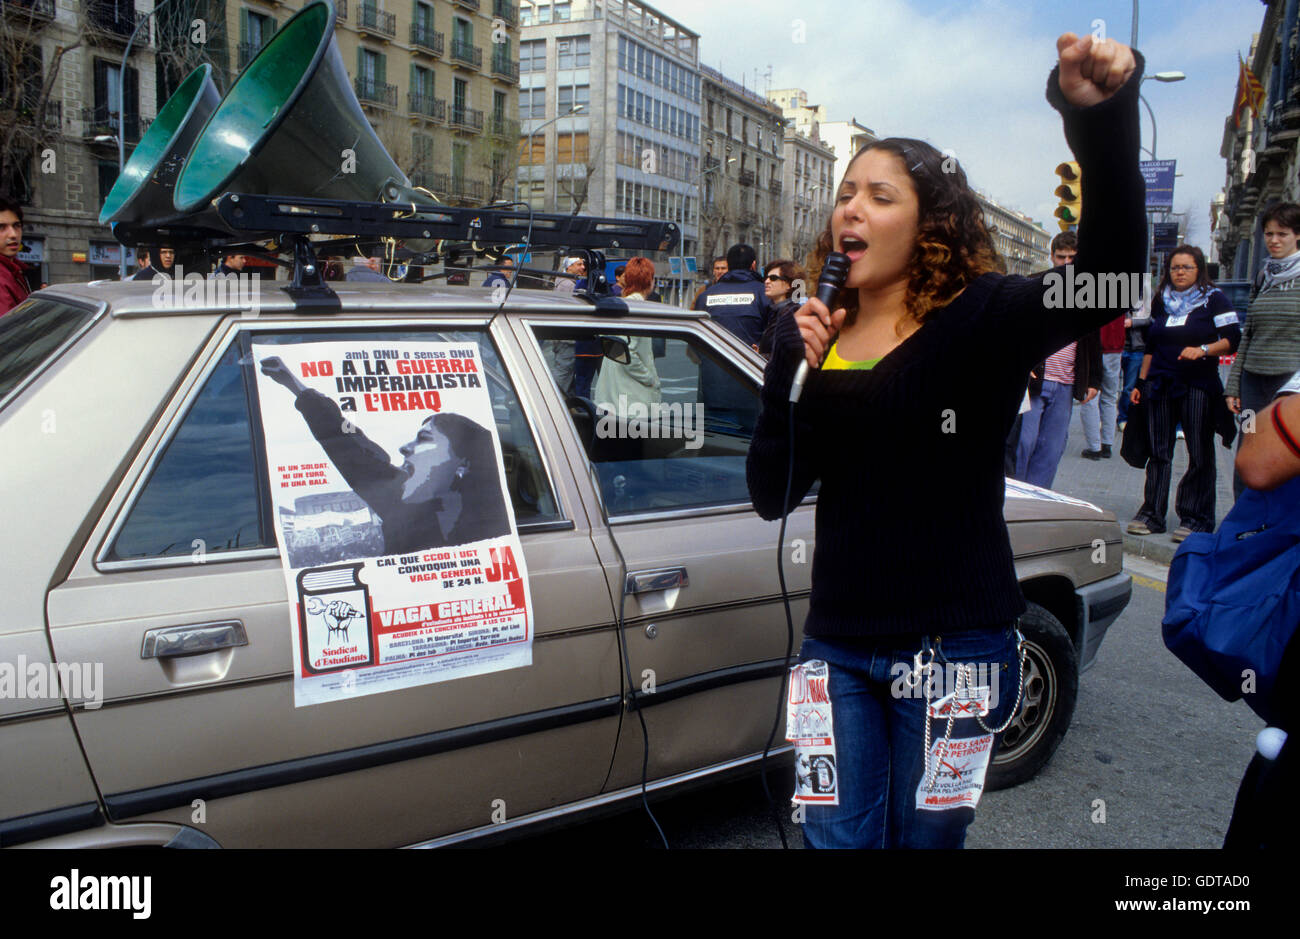 Barcelona: Demostration against the war in Irak. Barcelona, April 2003. In Pla de Palau - Stock Image